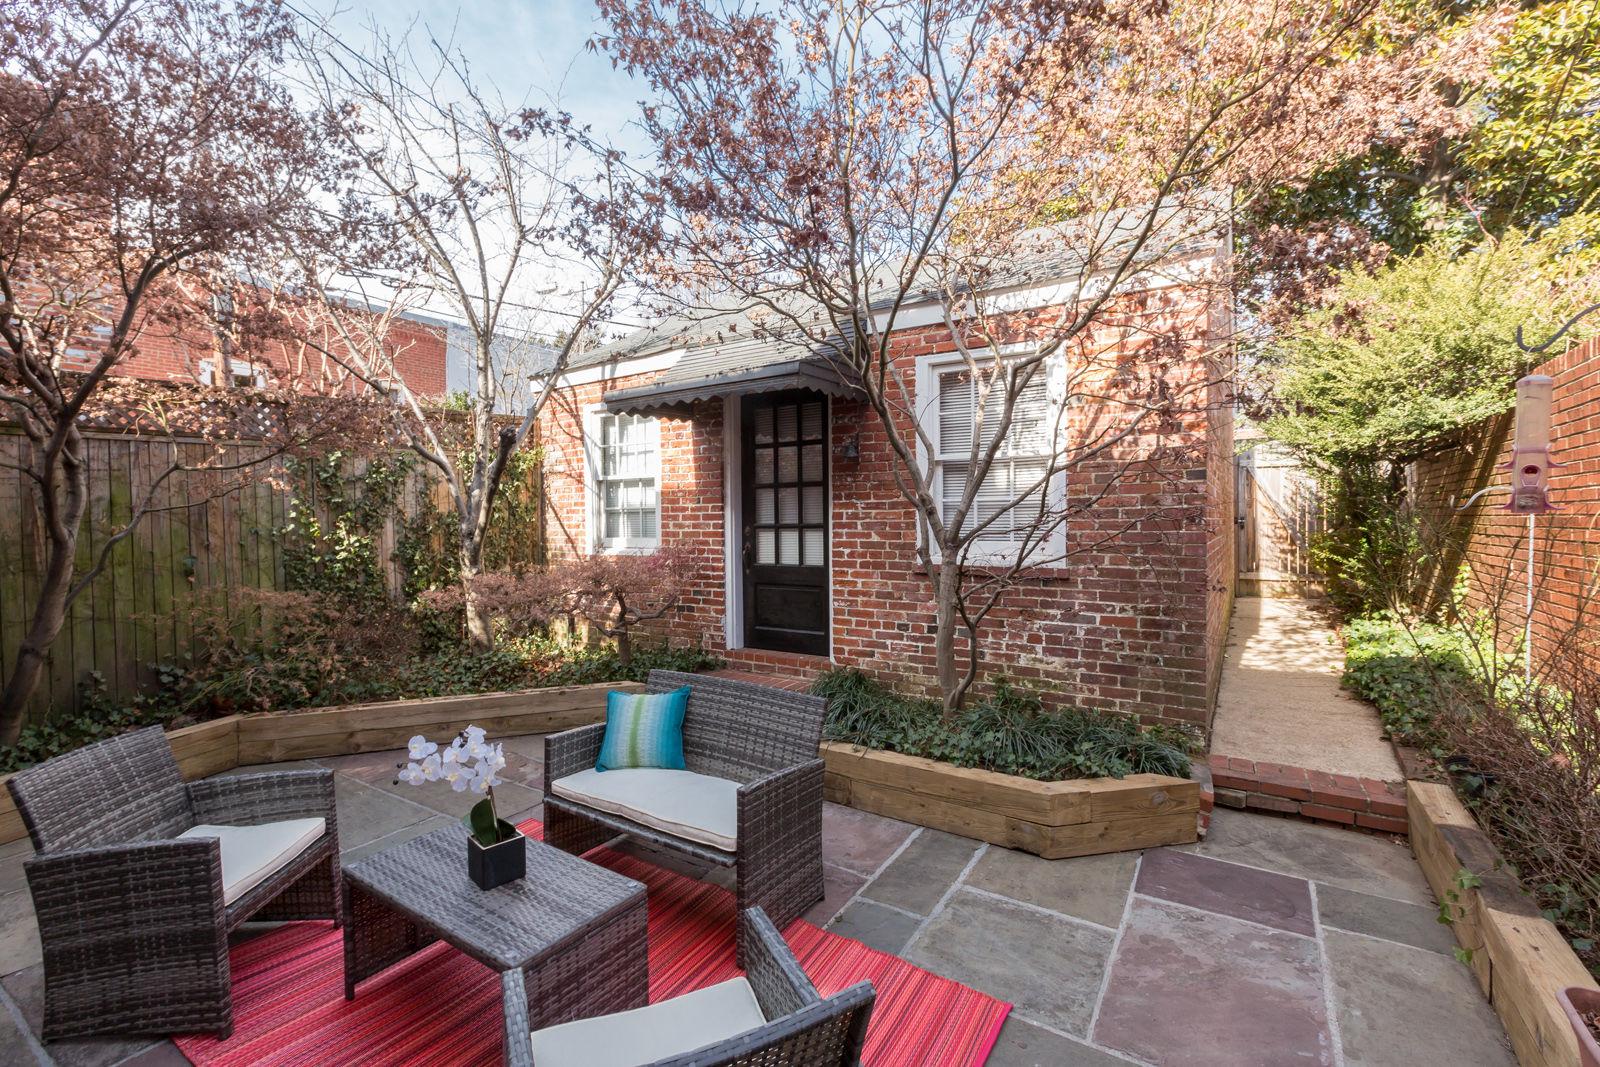 The backyard patio of the home. (Courtesy Sean Shanahan)